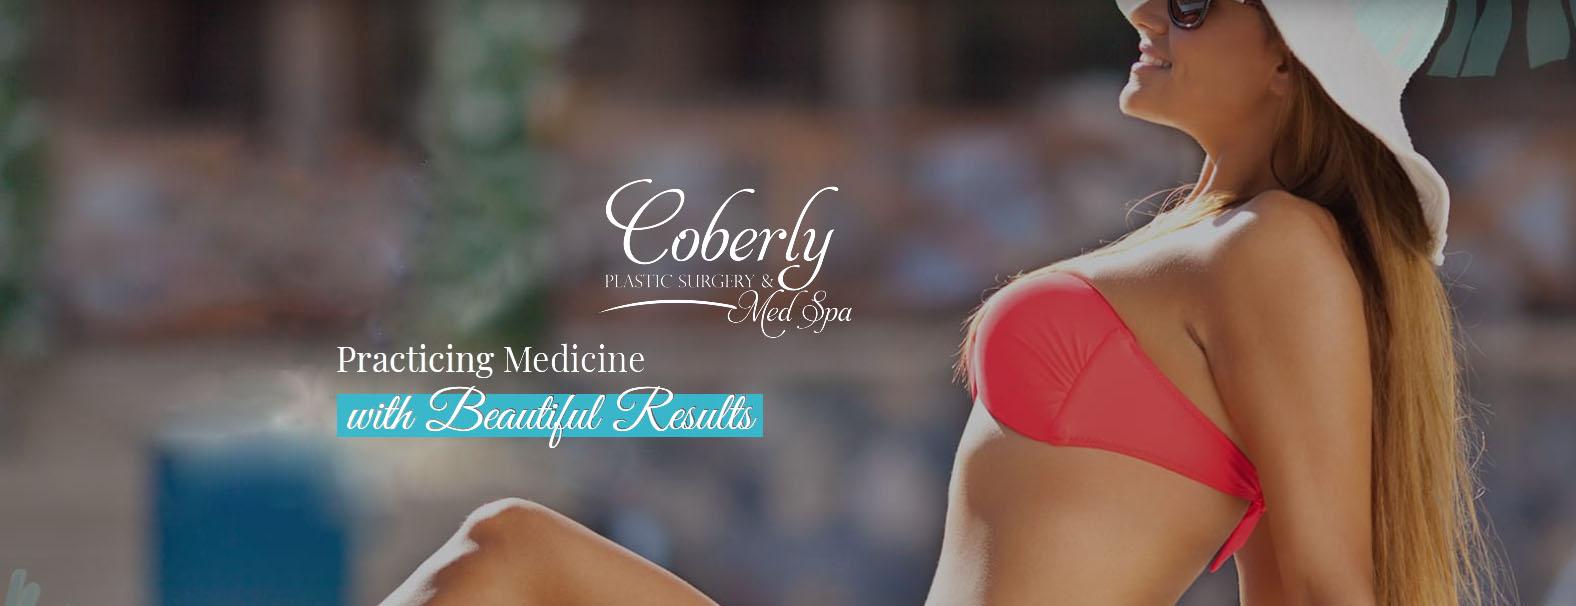 Coberly Plastic Surgery reviews | Plastic Surgeons at 508 S. Habana Ave. - Tampa FL